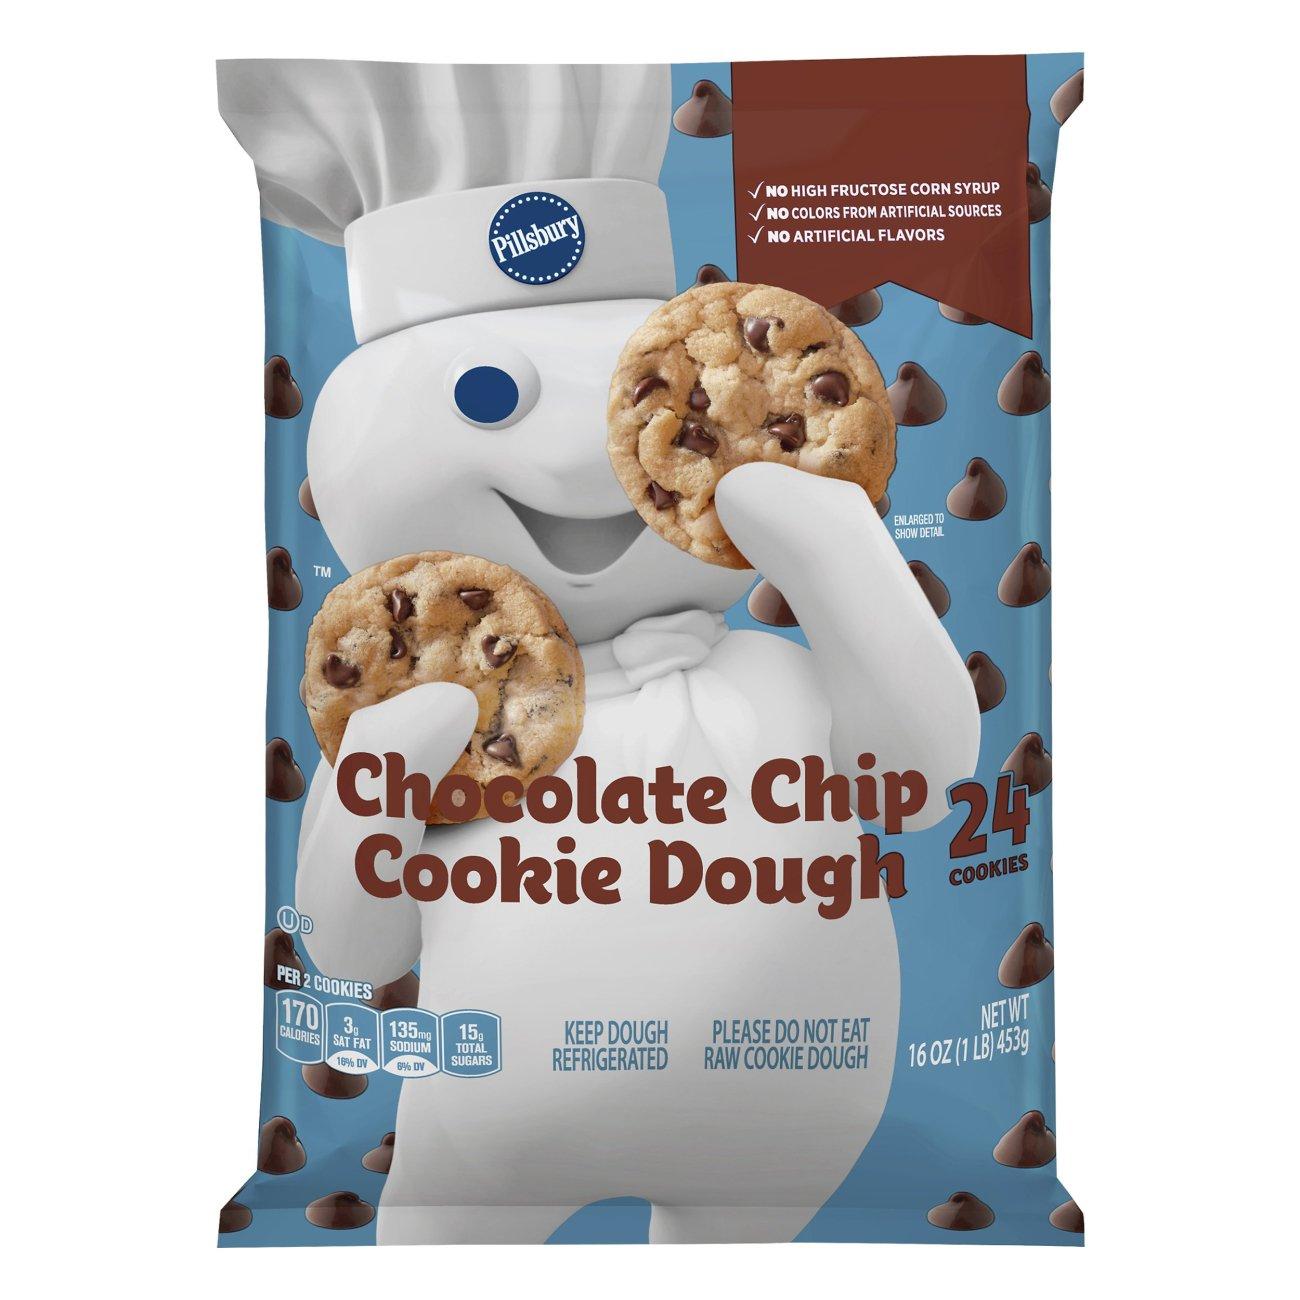 Image result for pillsbury cookies